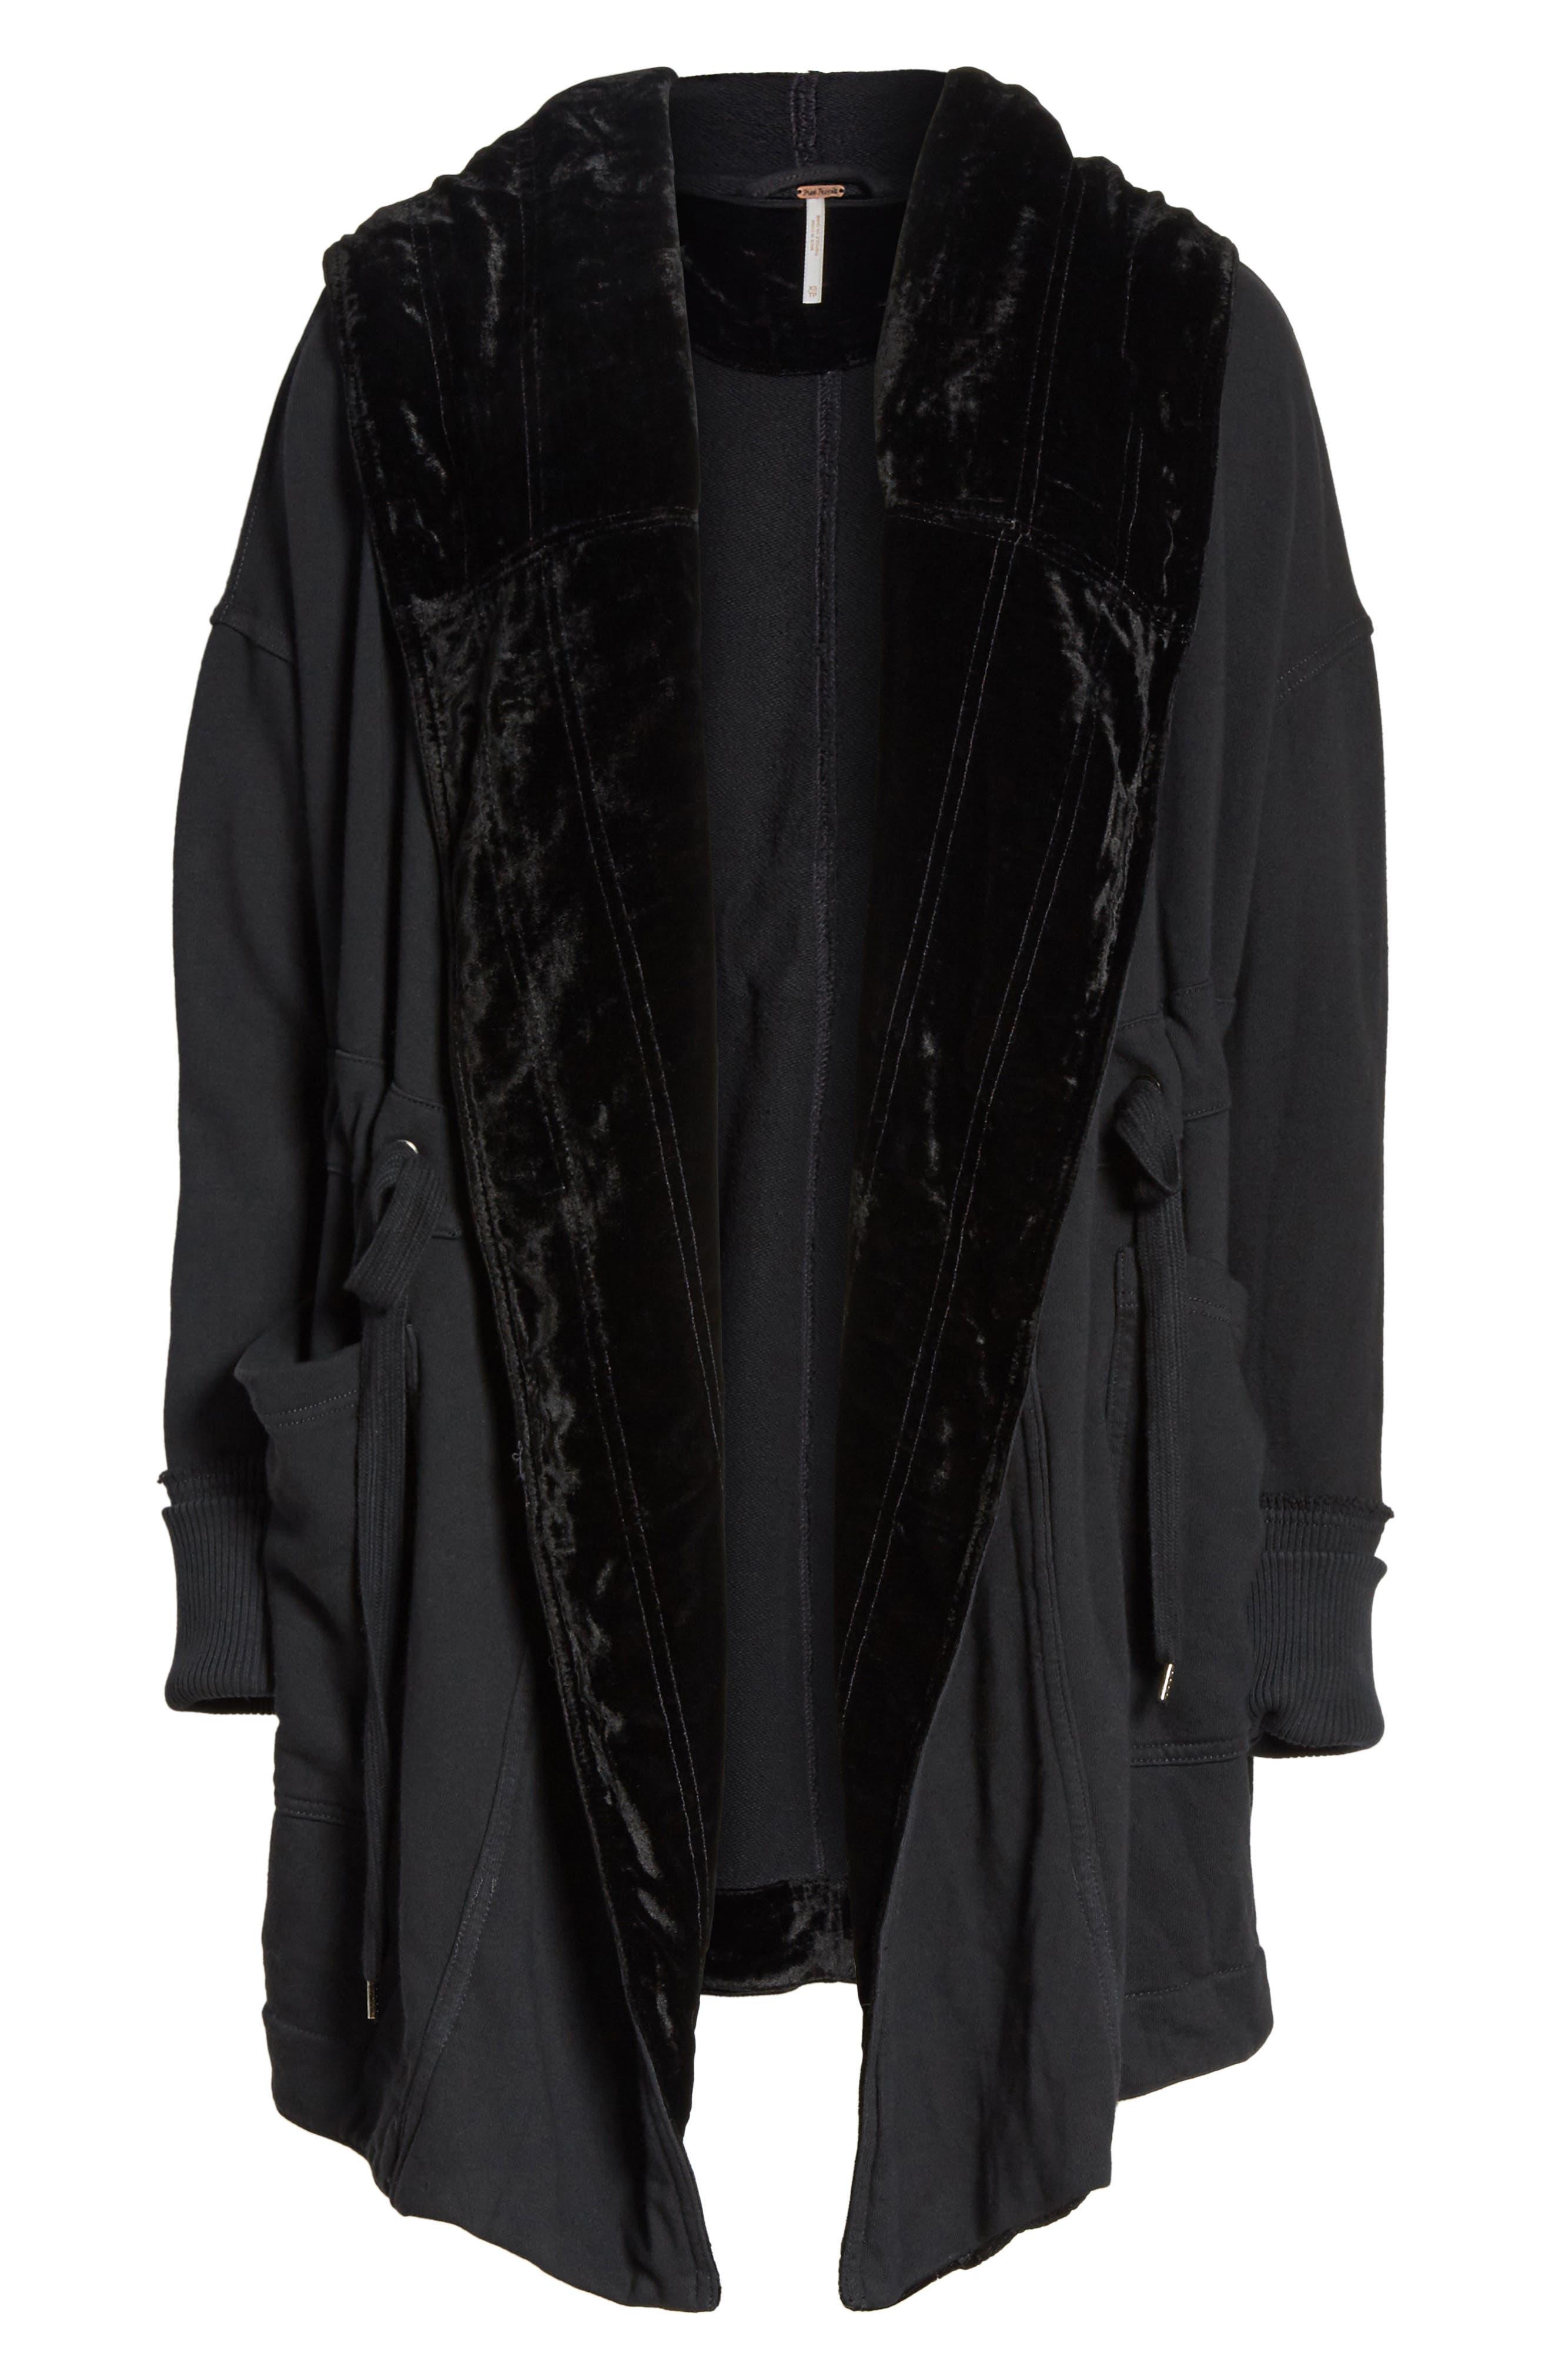 Westwood Cardigan,                             Alternate thumbnail 6, color,                             Black